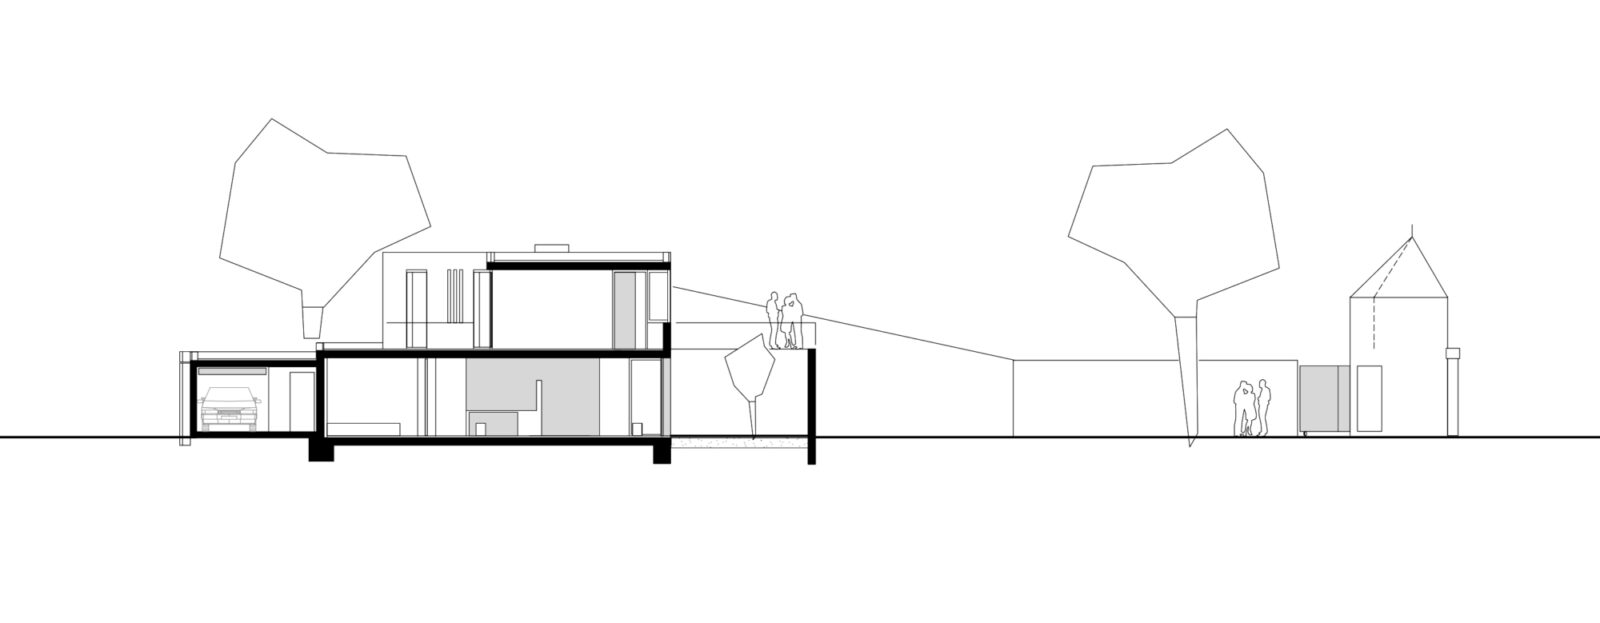 Section C–C